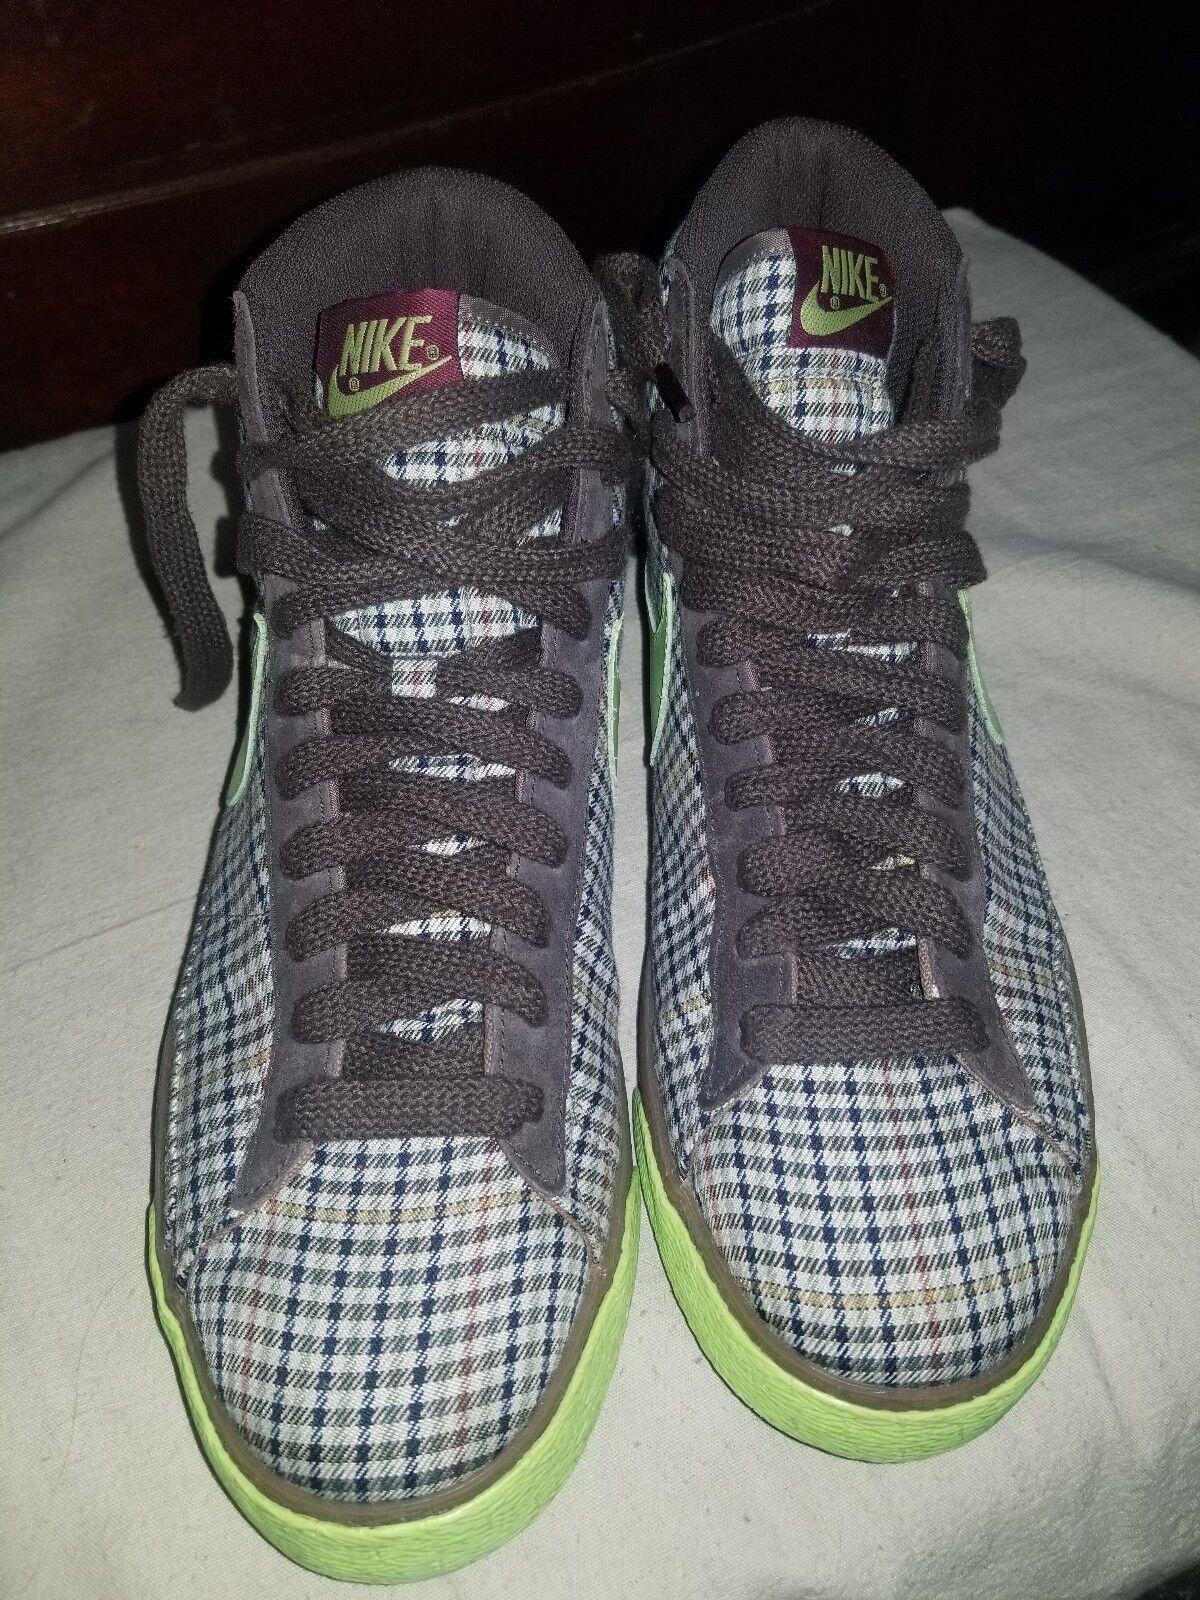 Nike Blazer High Grid Brown Plaid 318642-231 Size US 11.5 Preowned